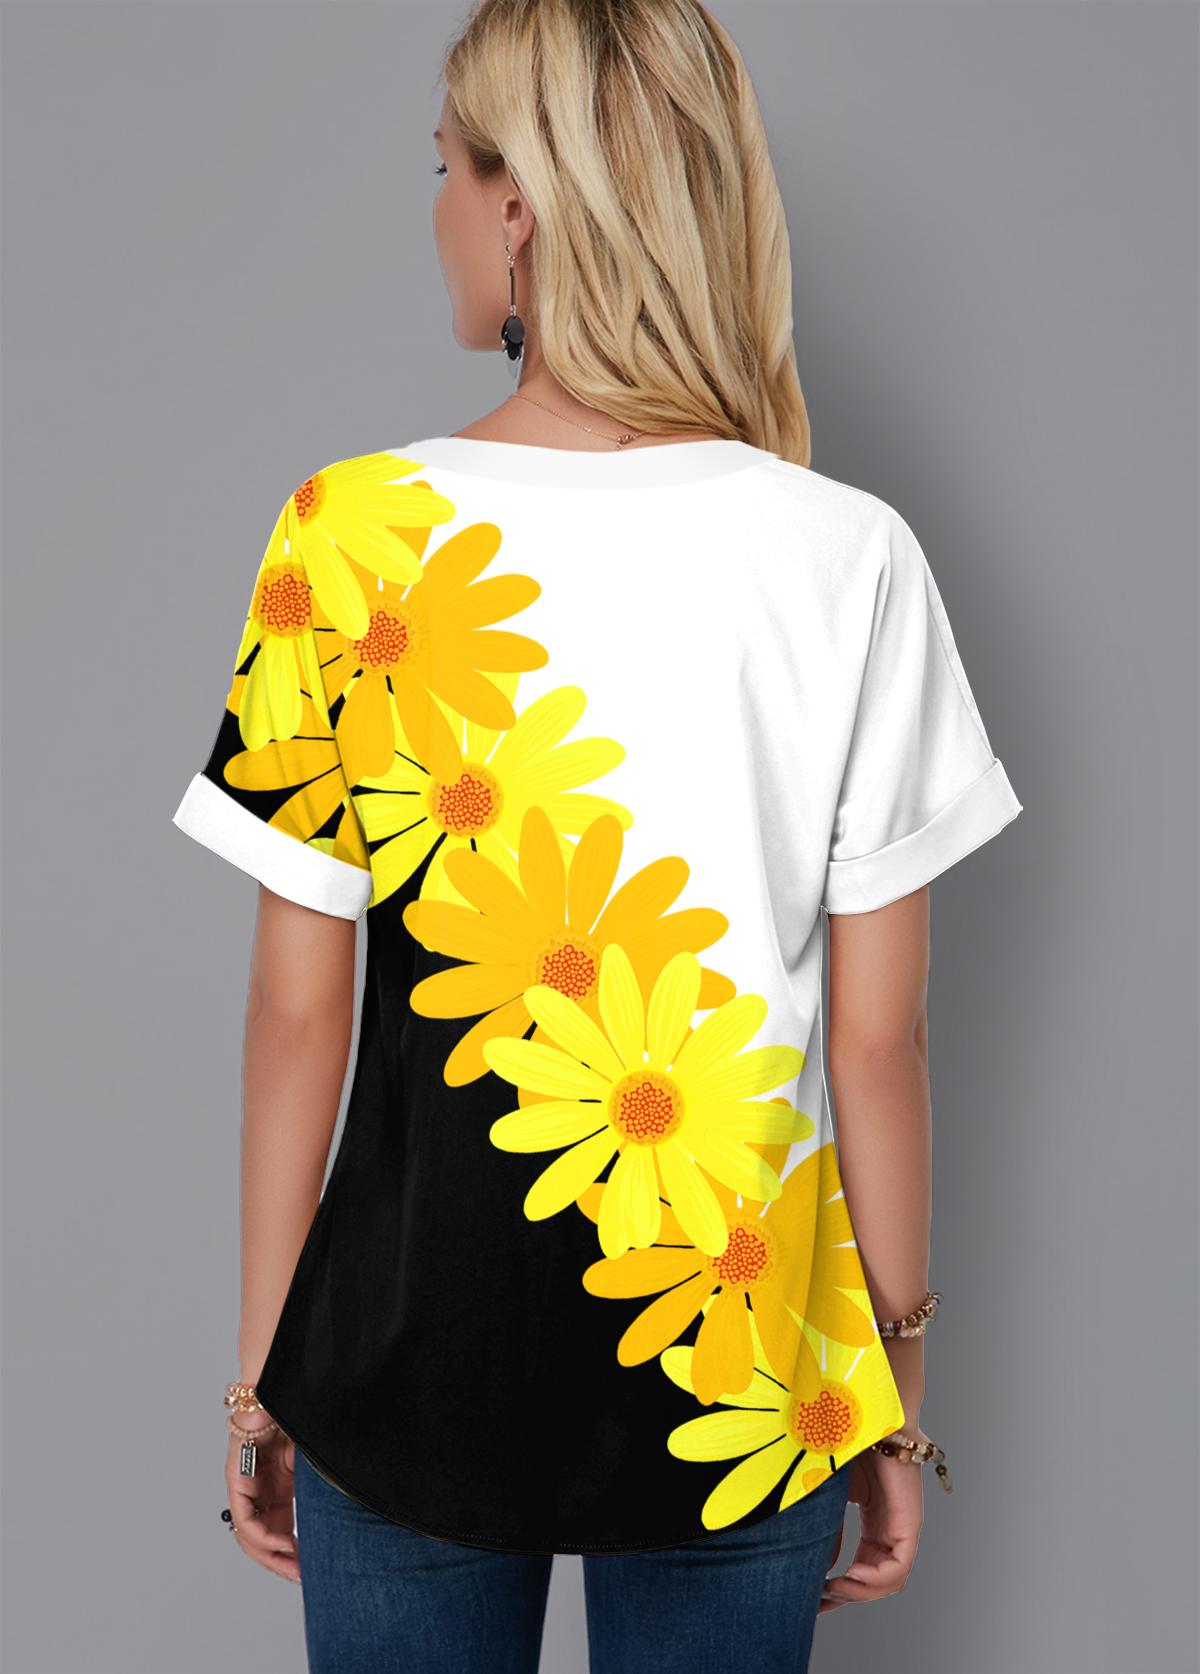 Lace Up Color Block Daisy Print Blouse